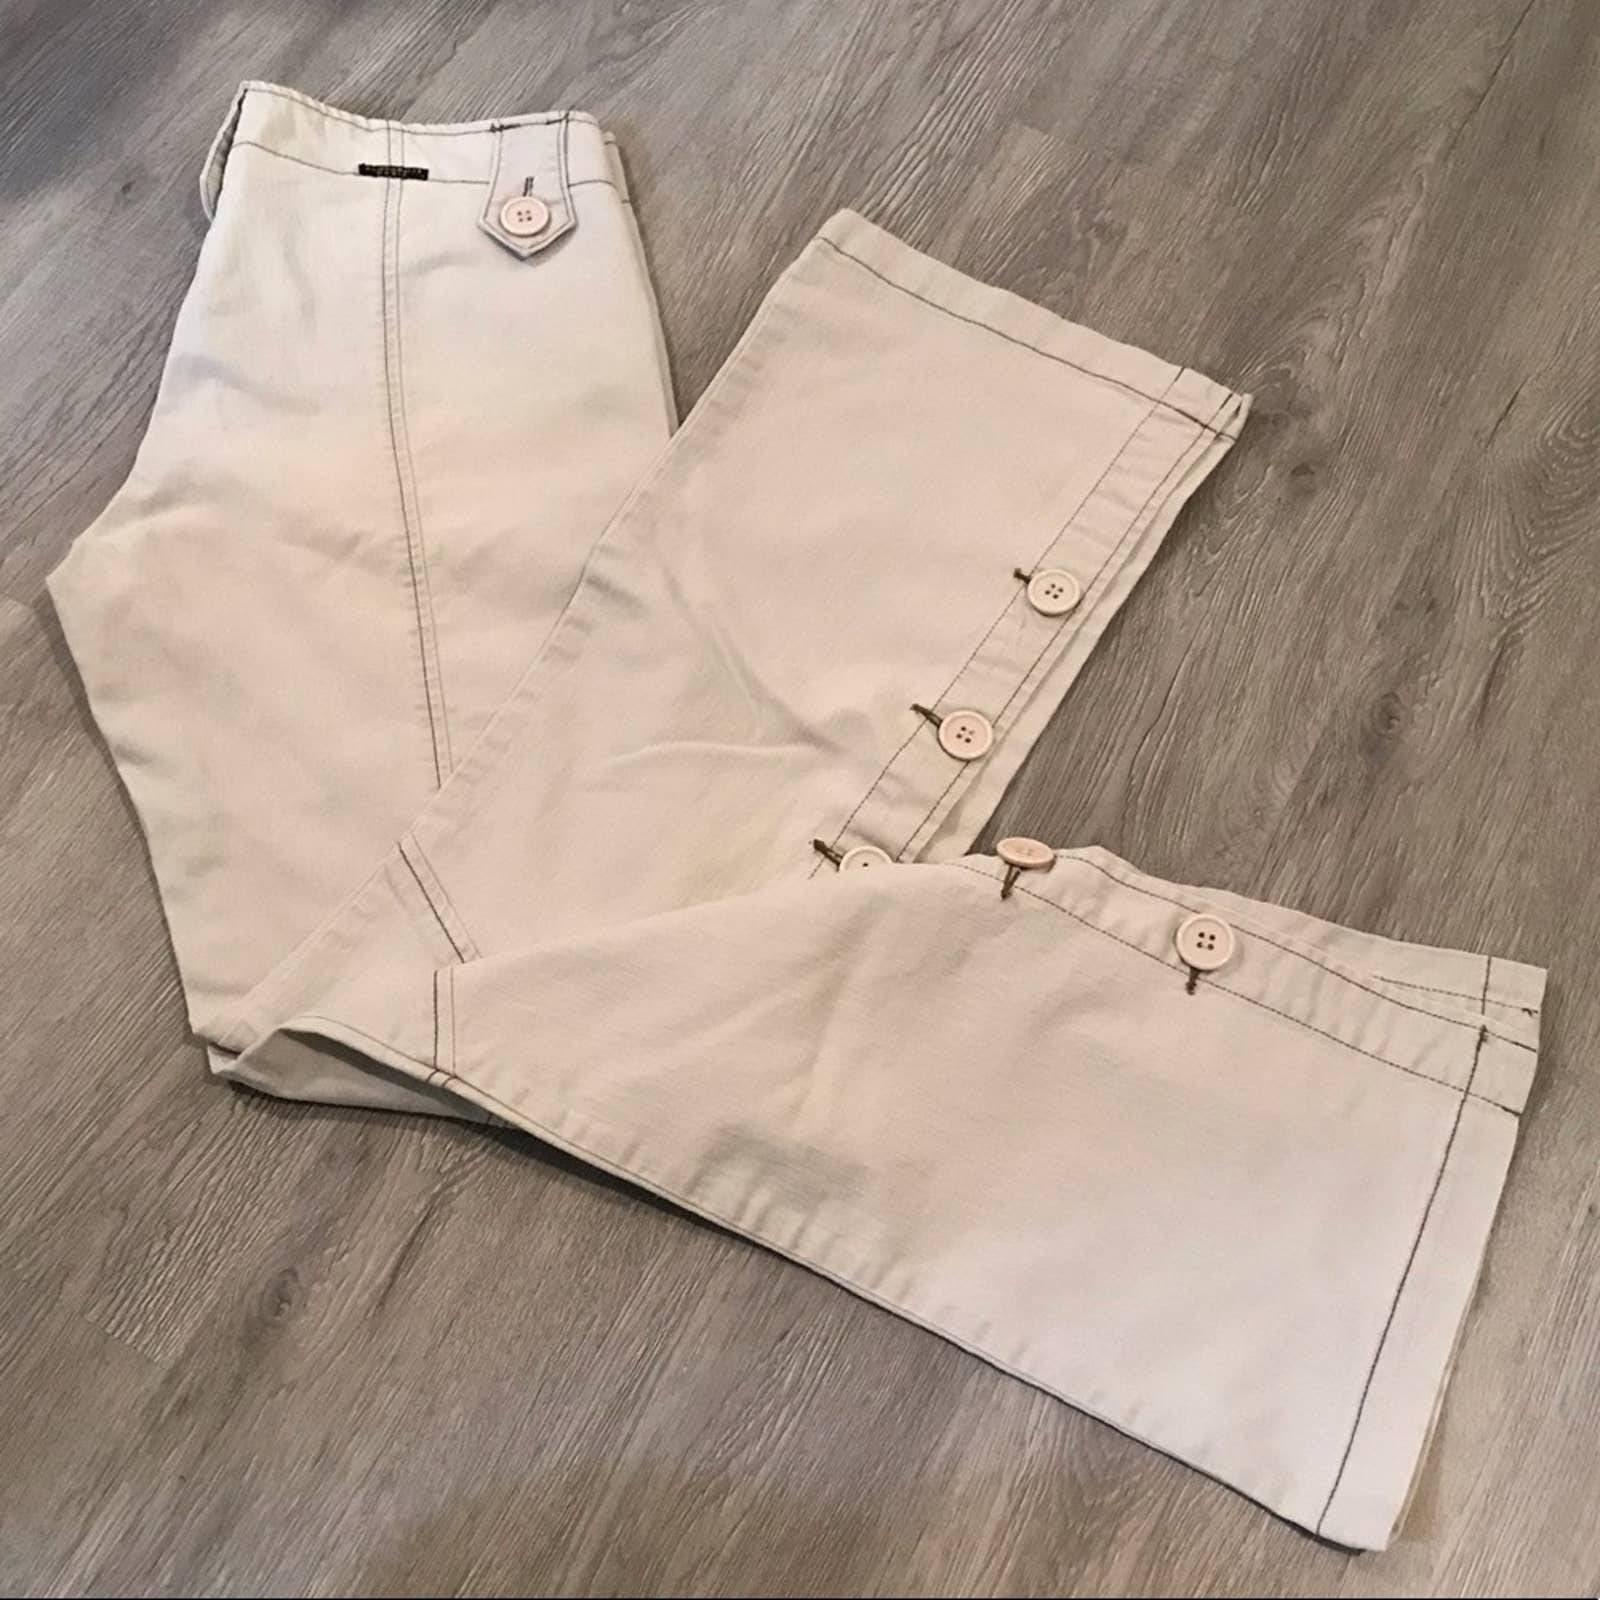 Z Cavaricci Off White Pants 11 Juniors